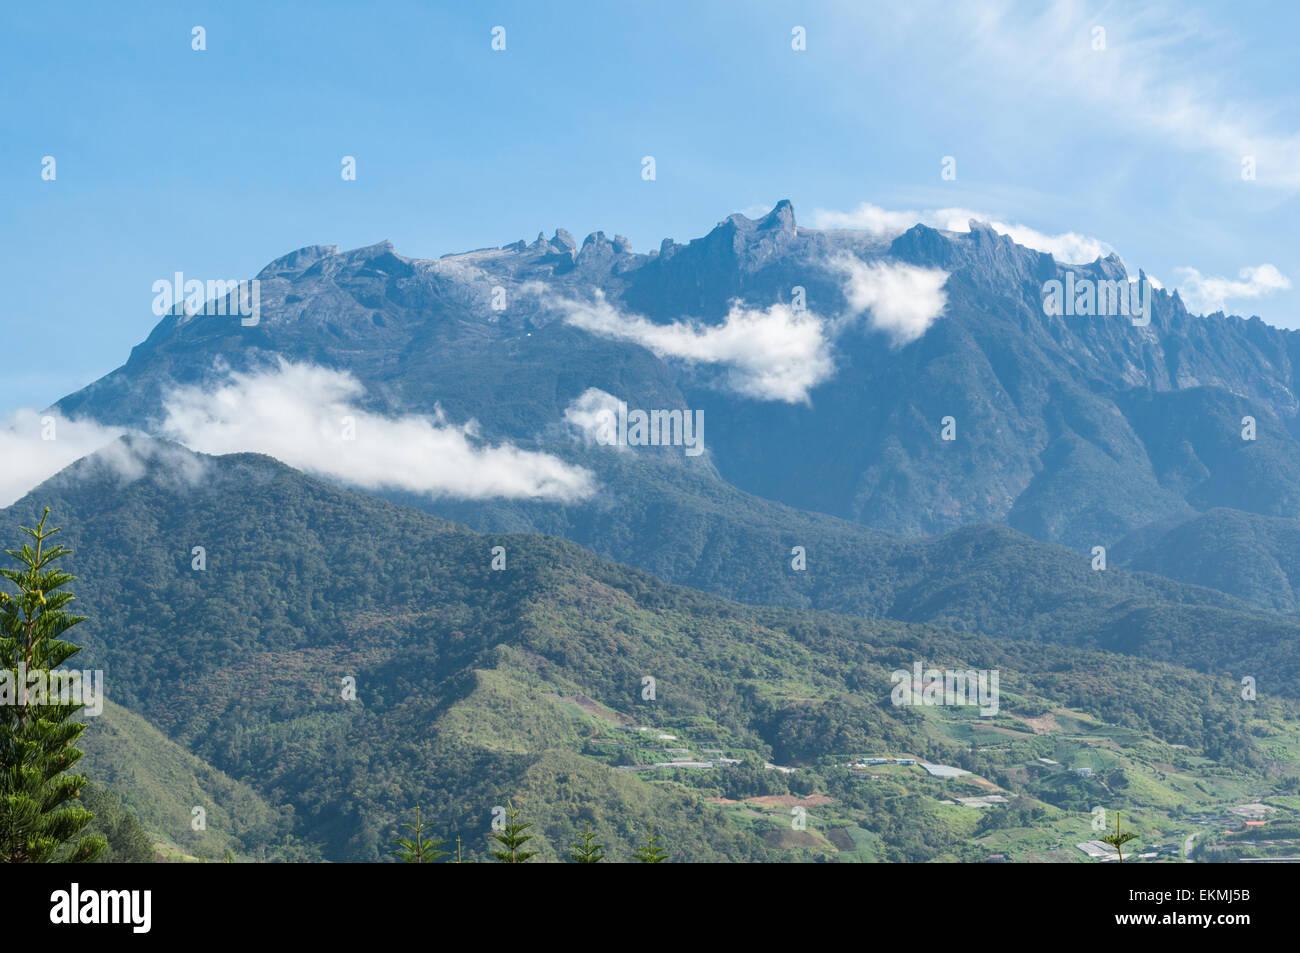 View of the Mount Kota Kinabalu, Borneo, Malaysia - Stock Image